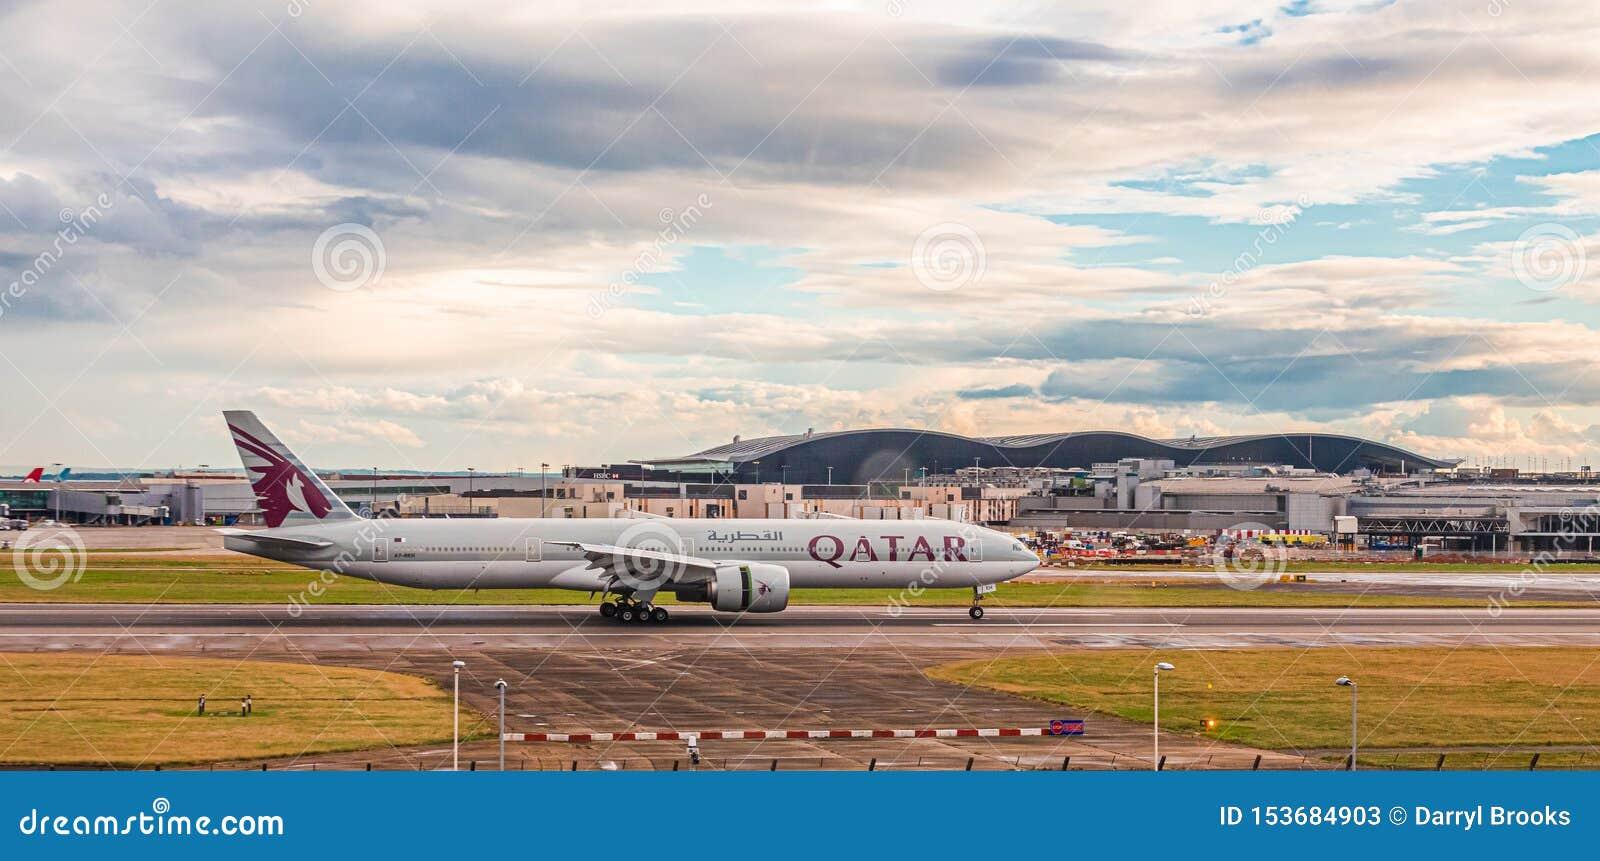 Qatar Airlines at Heathrow